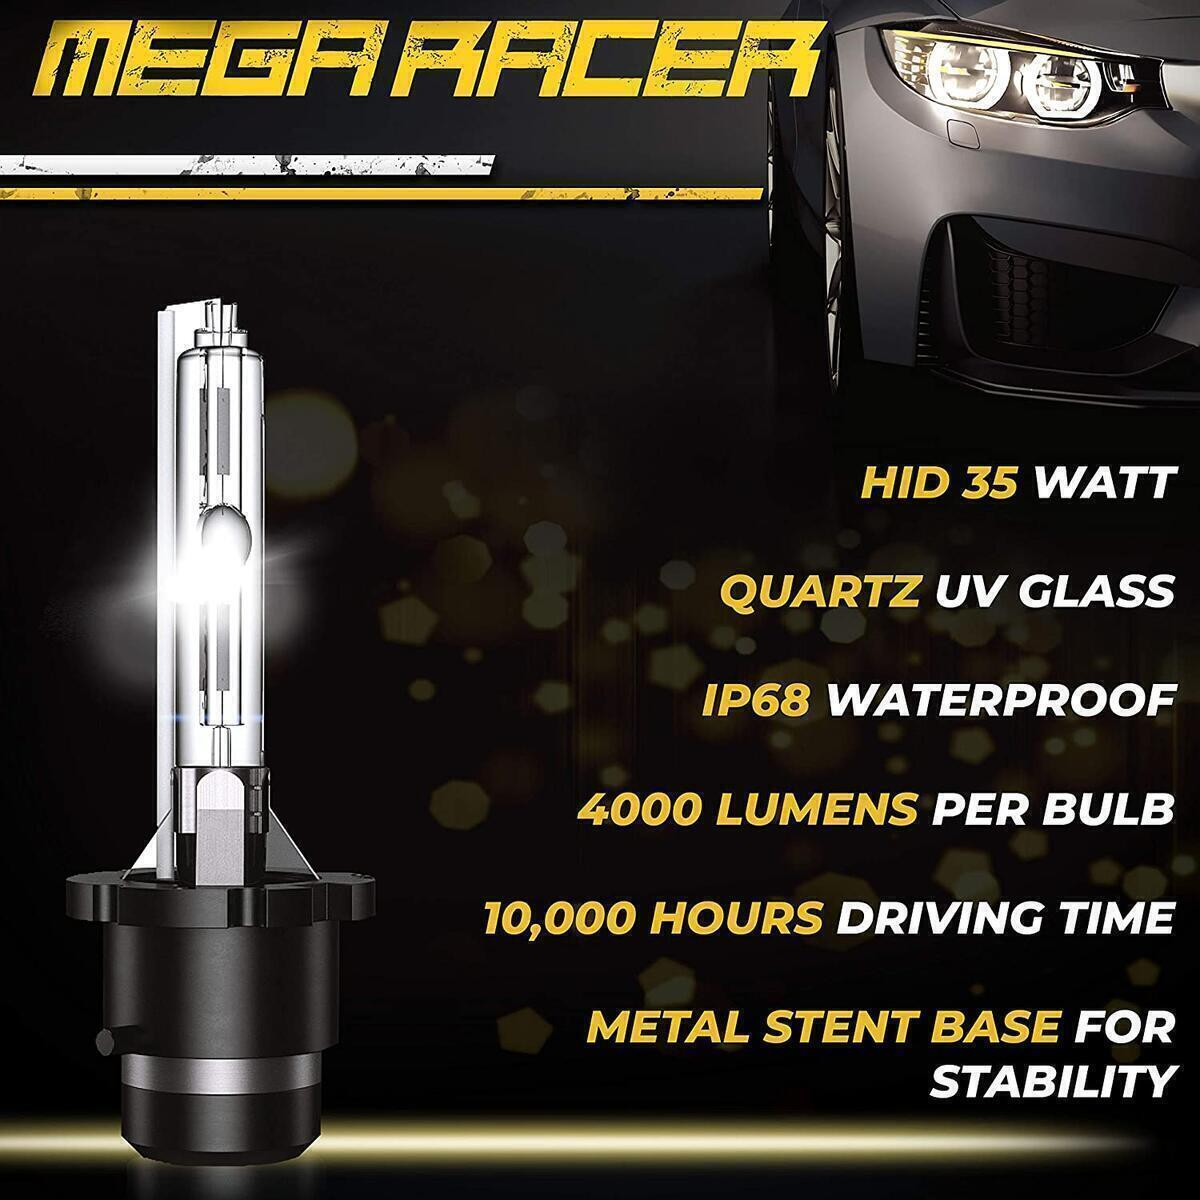 Mega Racer D4S HID Bulb 8000K Ice Blue D4S/D4R Xenon HID Bulbs for Low Beam High Beam Replacement Bulbs, 35W 8000 Lumens Metal Stents Base 12V IP68 Waterproof, Pack of 2